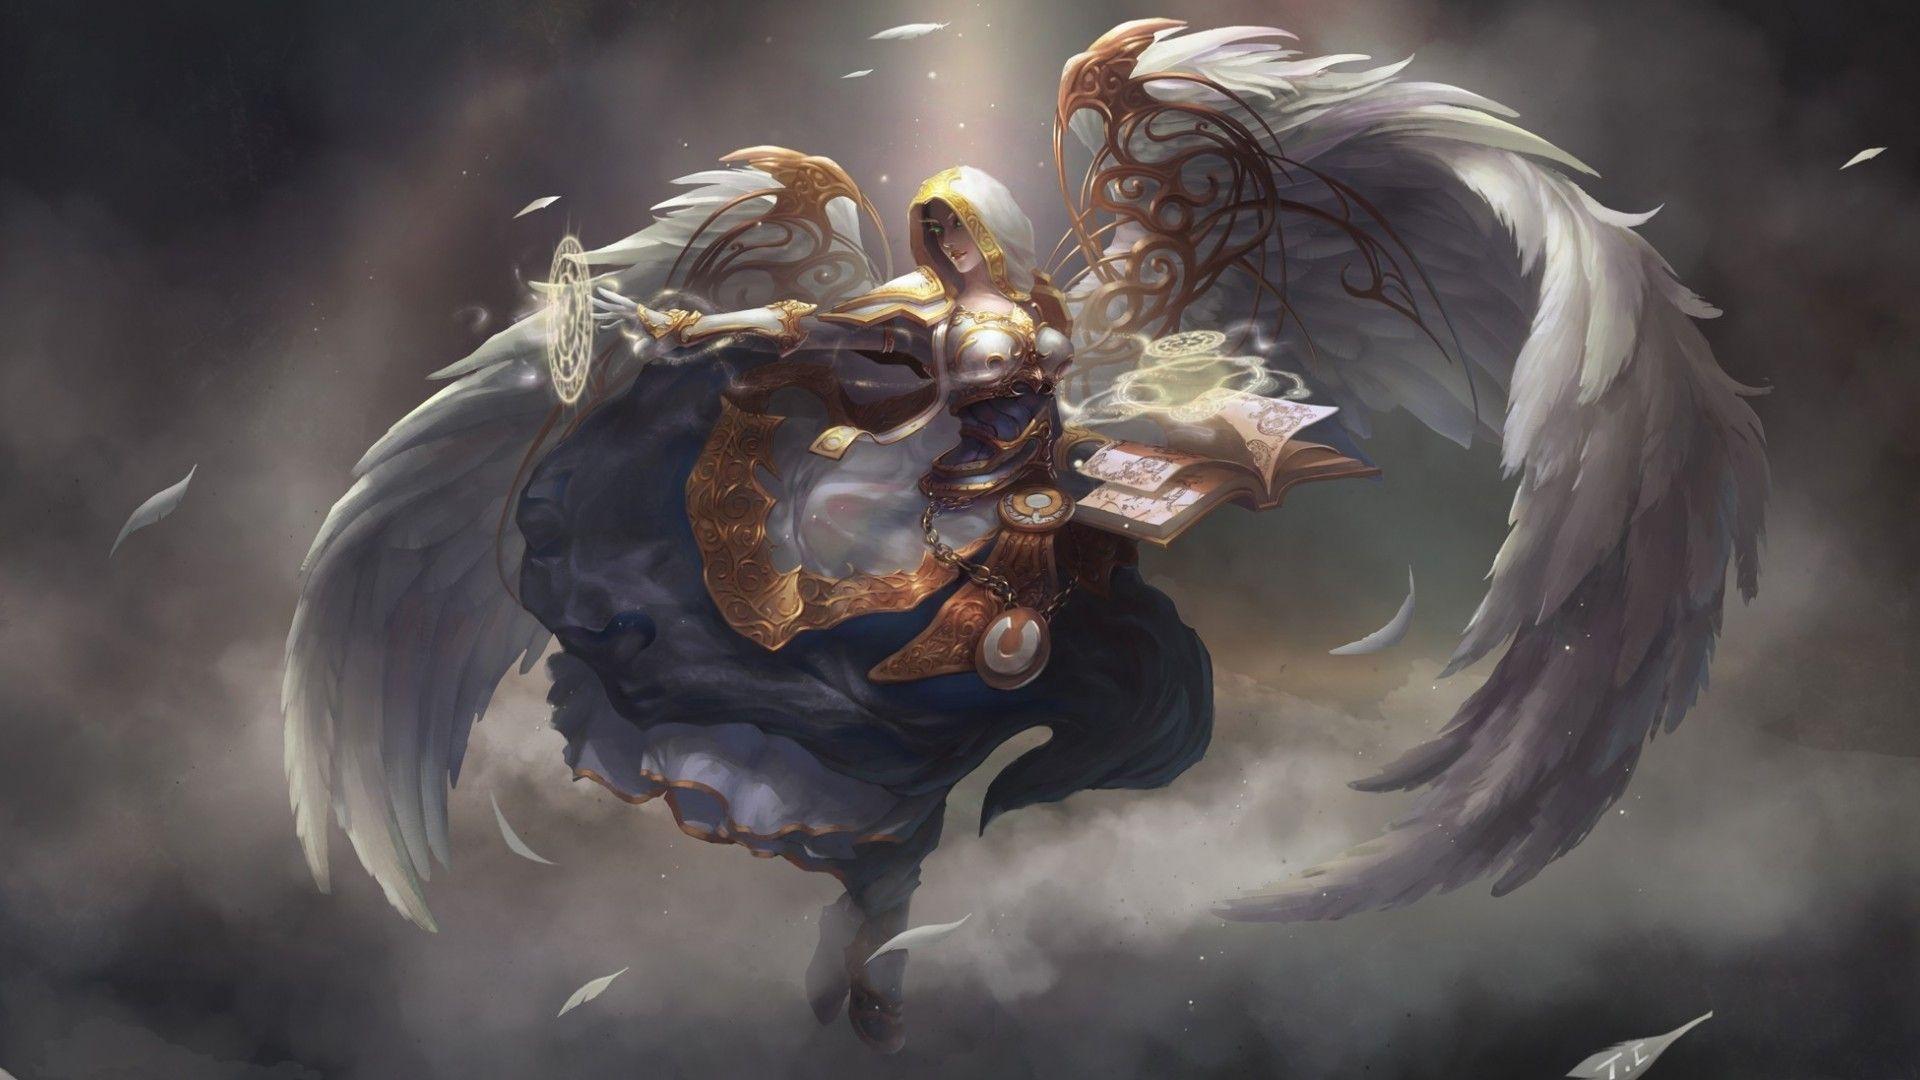 Angel Book Magic Wings Wow World Warcraft Fantasy Fantasy Desktop